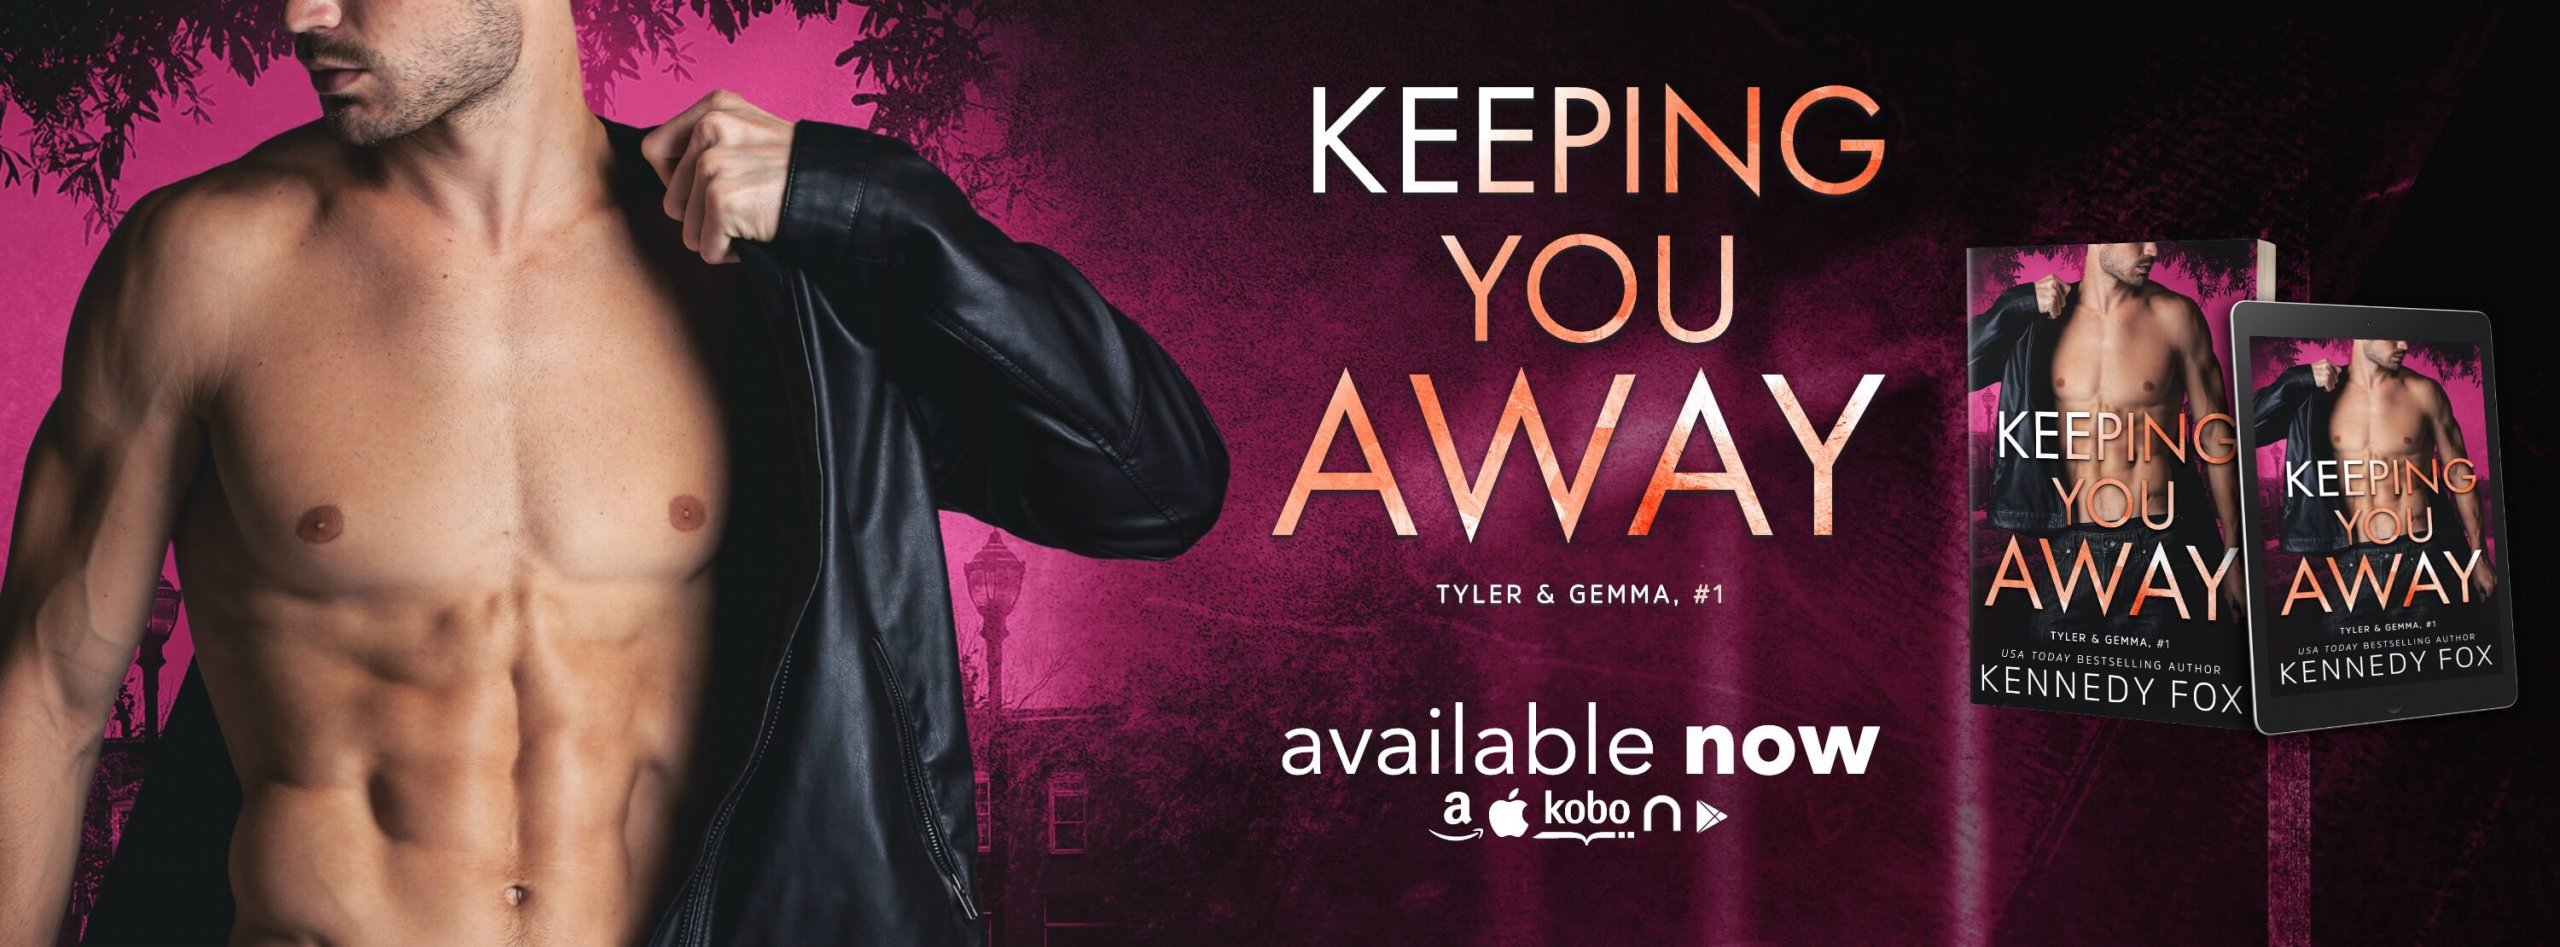 Blog Tour Review:  Keeping You Away (Tyler & Gemma #1, Ex-Con Duet Series #1) by Kennedy Fox